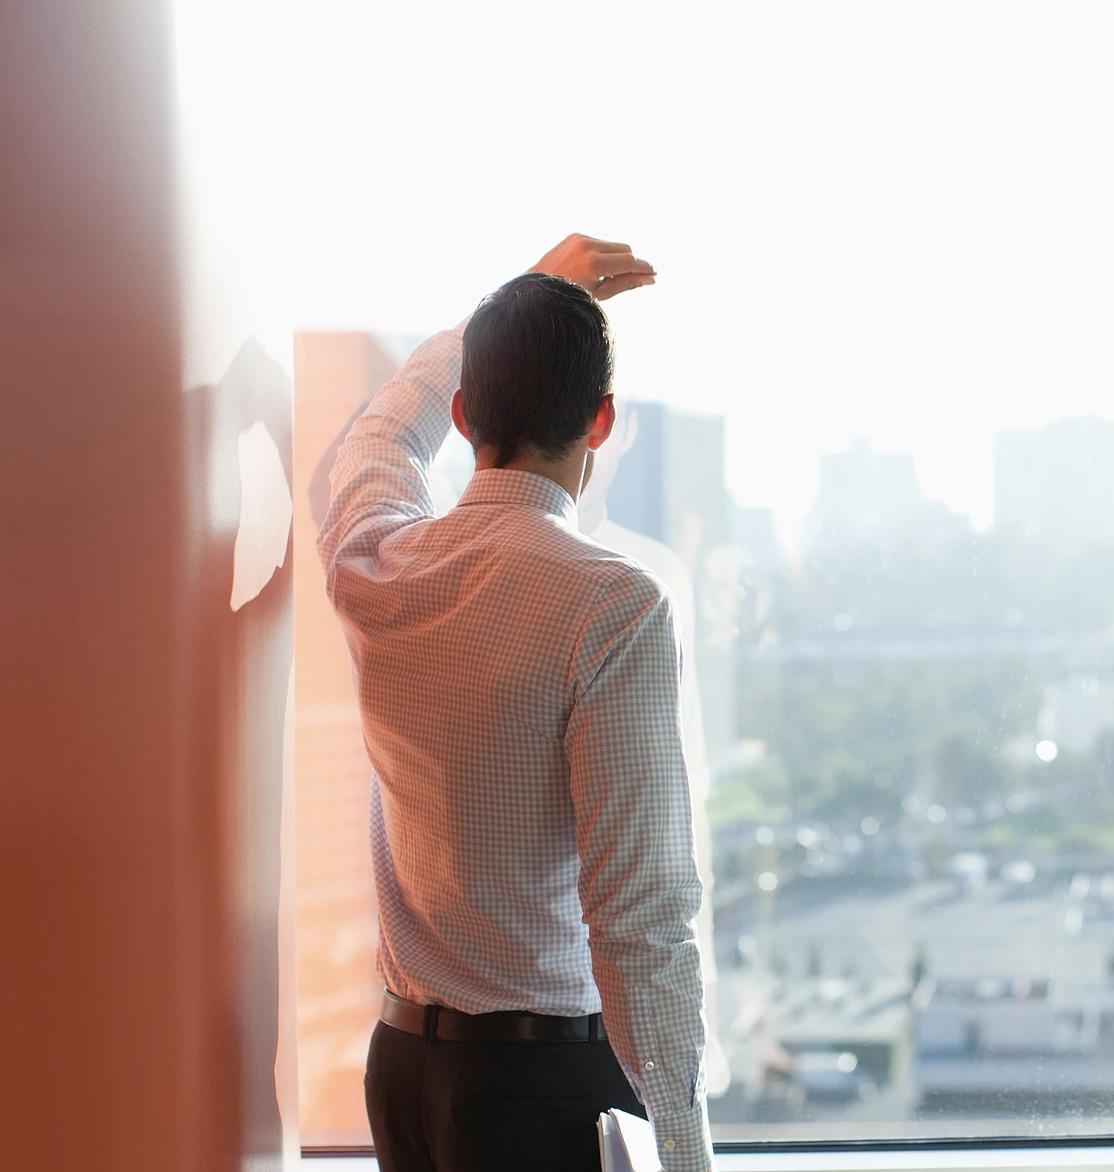 Career FAIL - TOP 10 Signs to Avoid